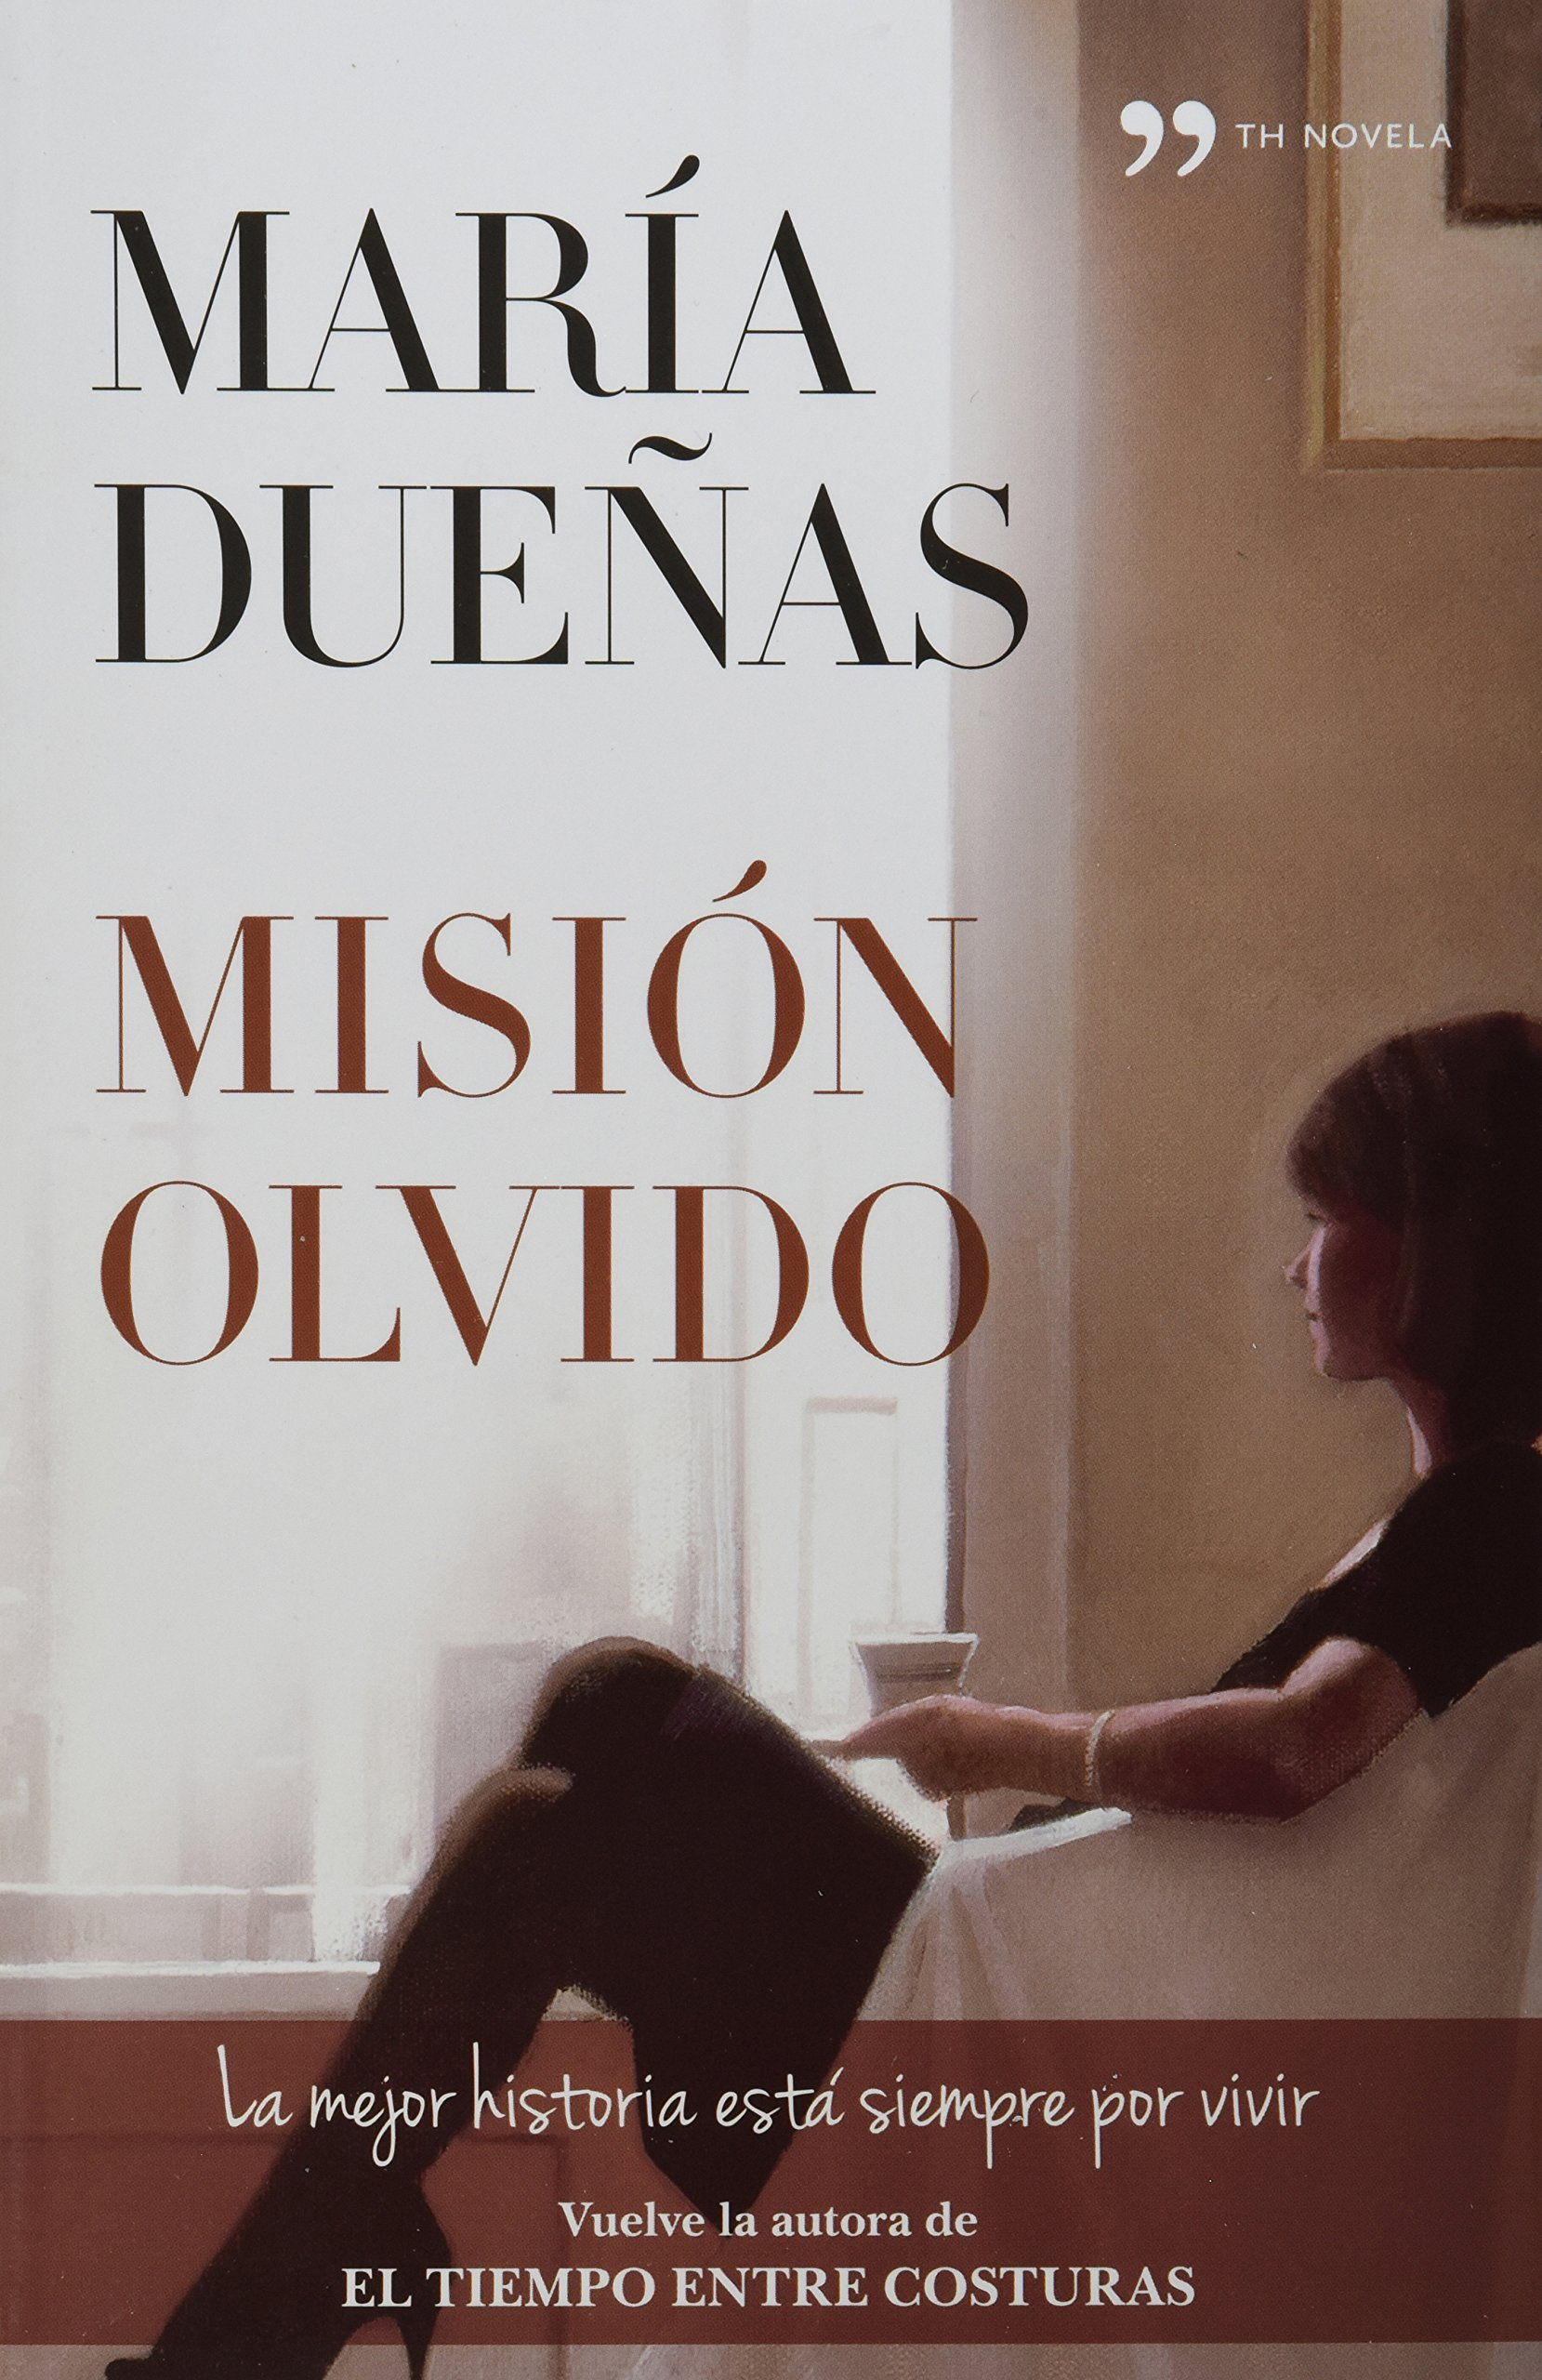 Mision olvido (Spanish Edition): María Dueñas: 9786070713422: Amazon.com: Books